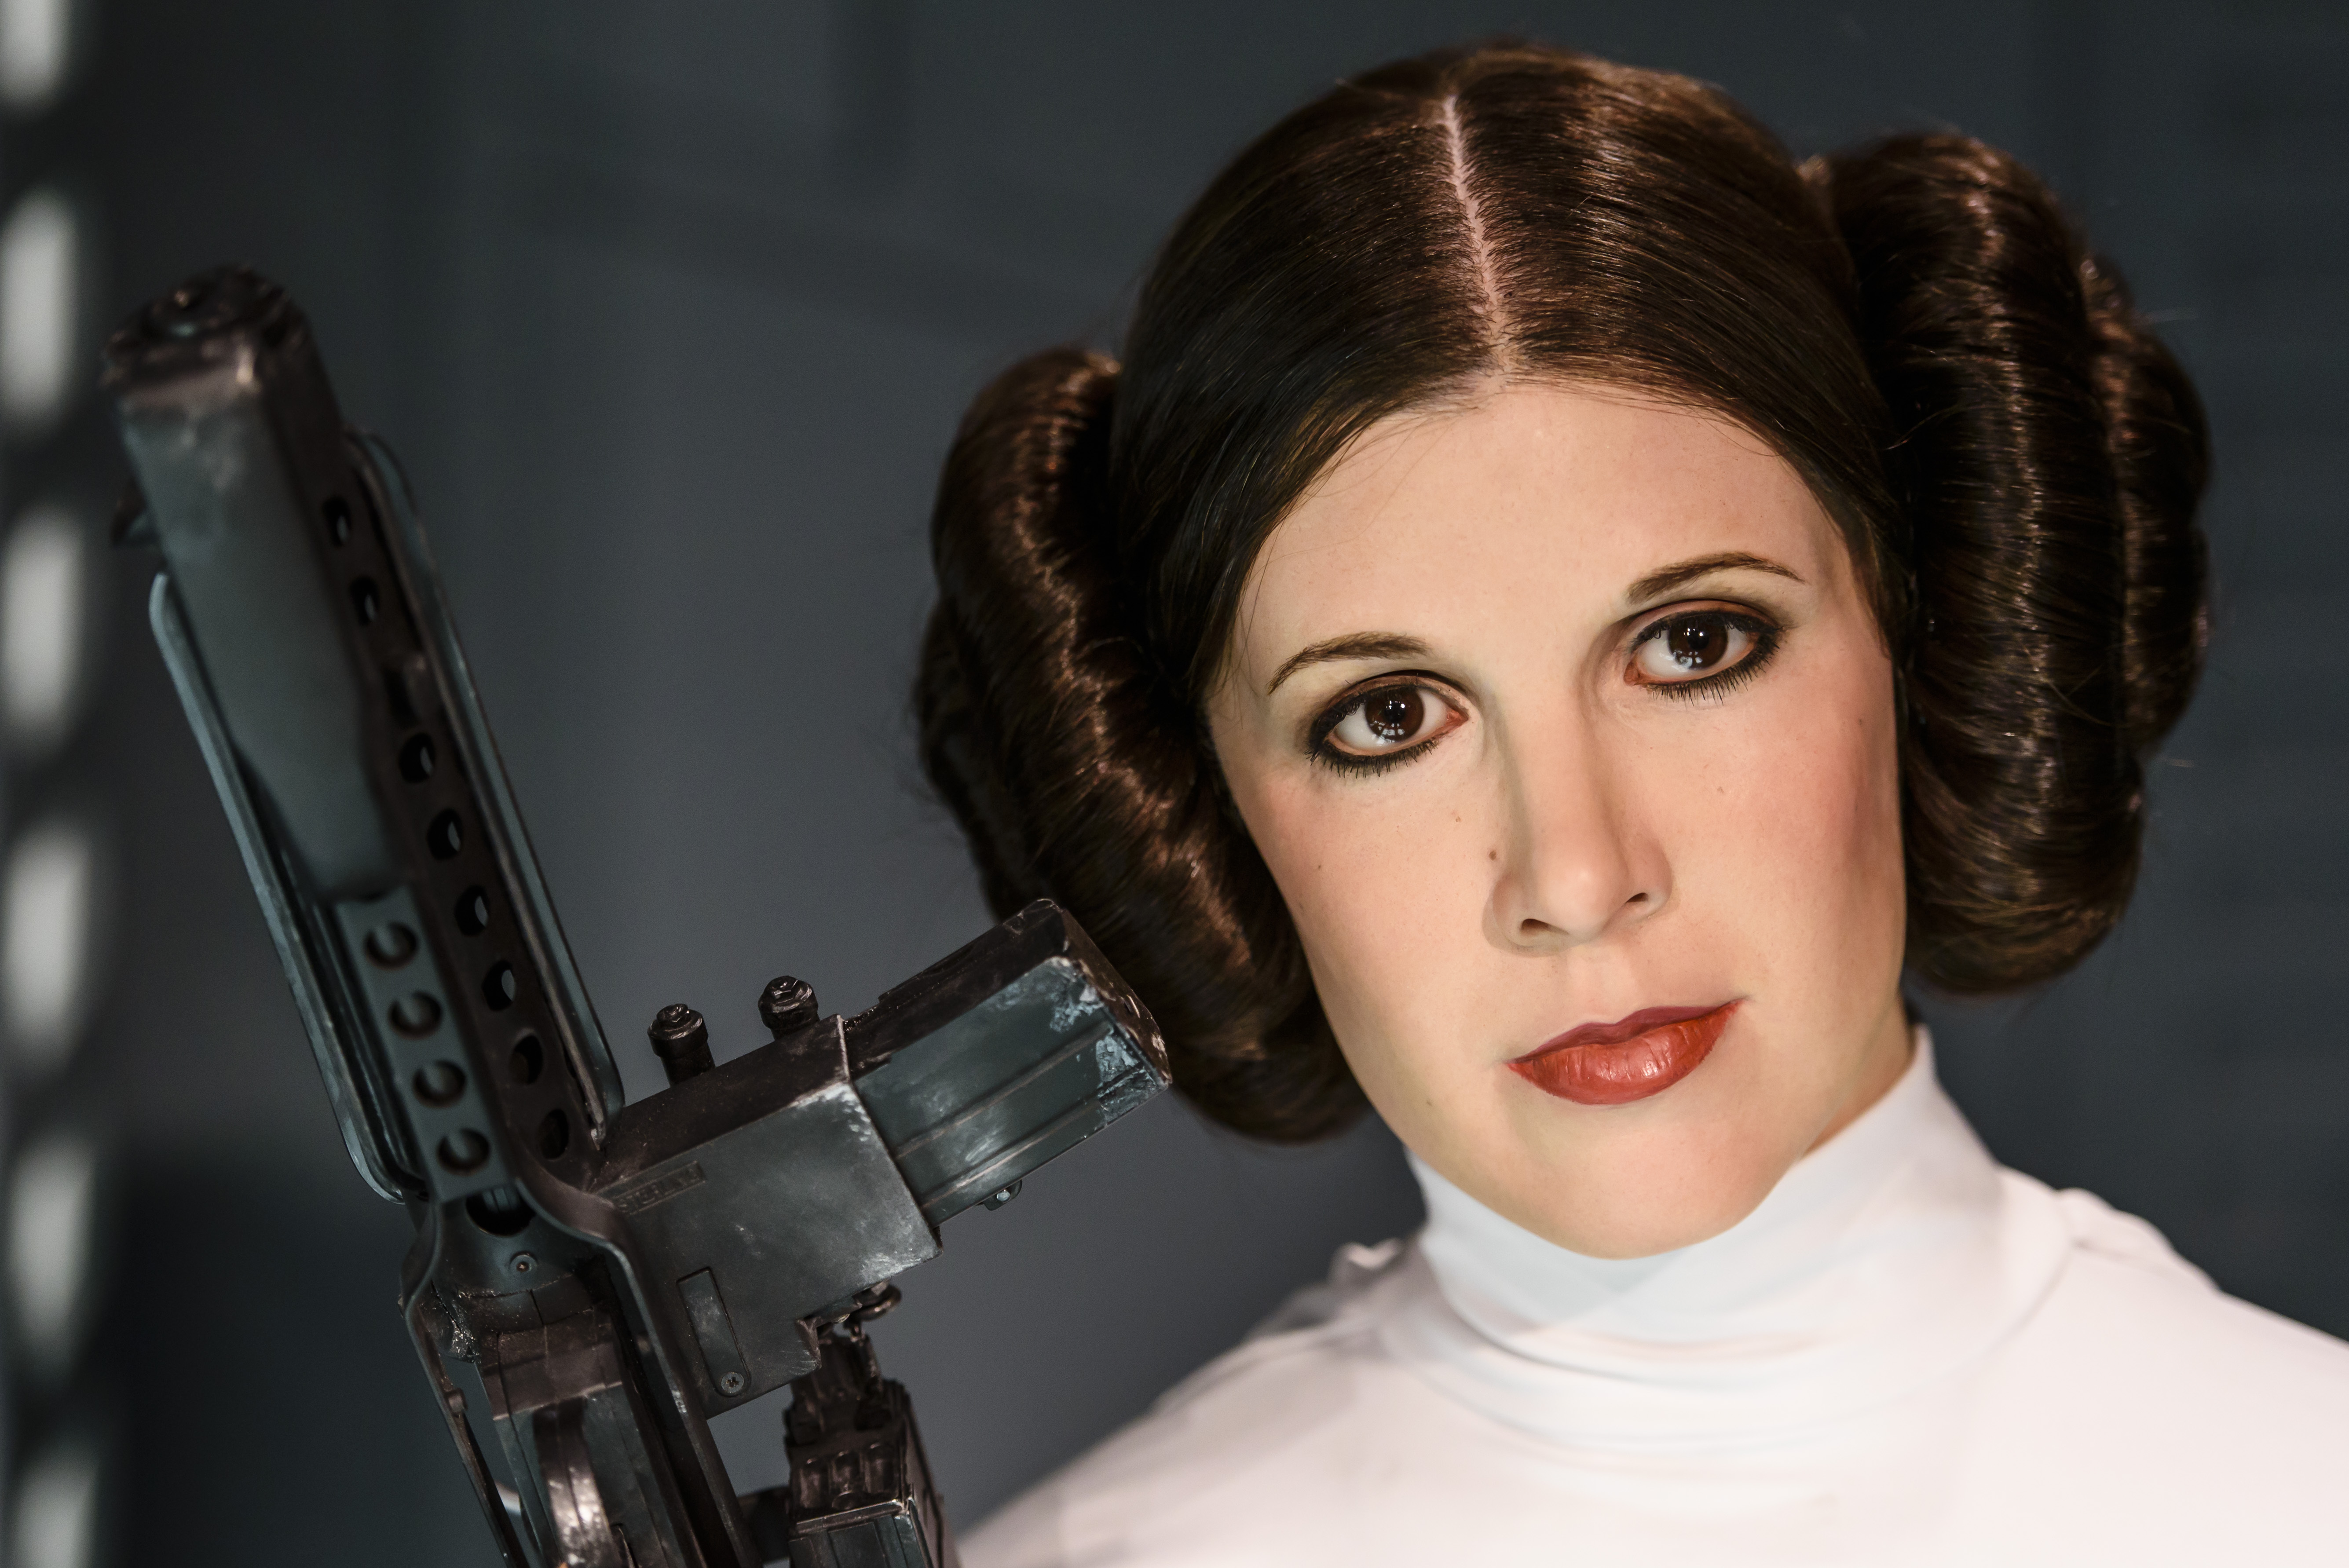 Princess Leia Wallpapers